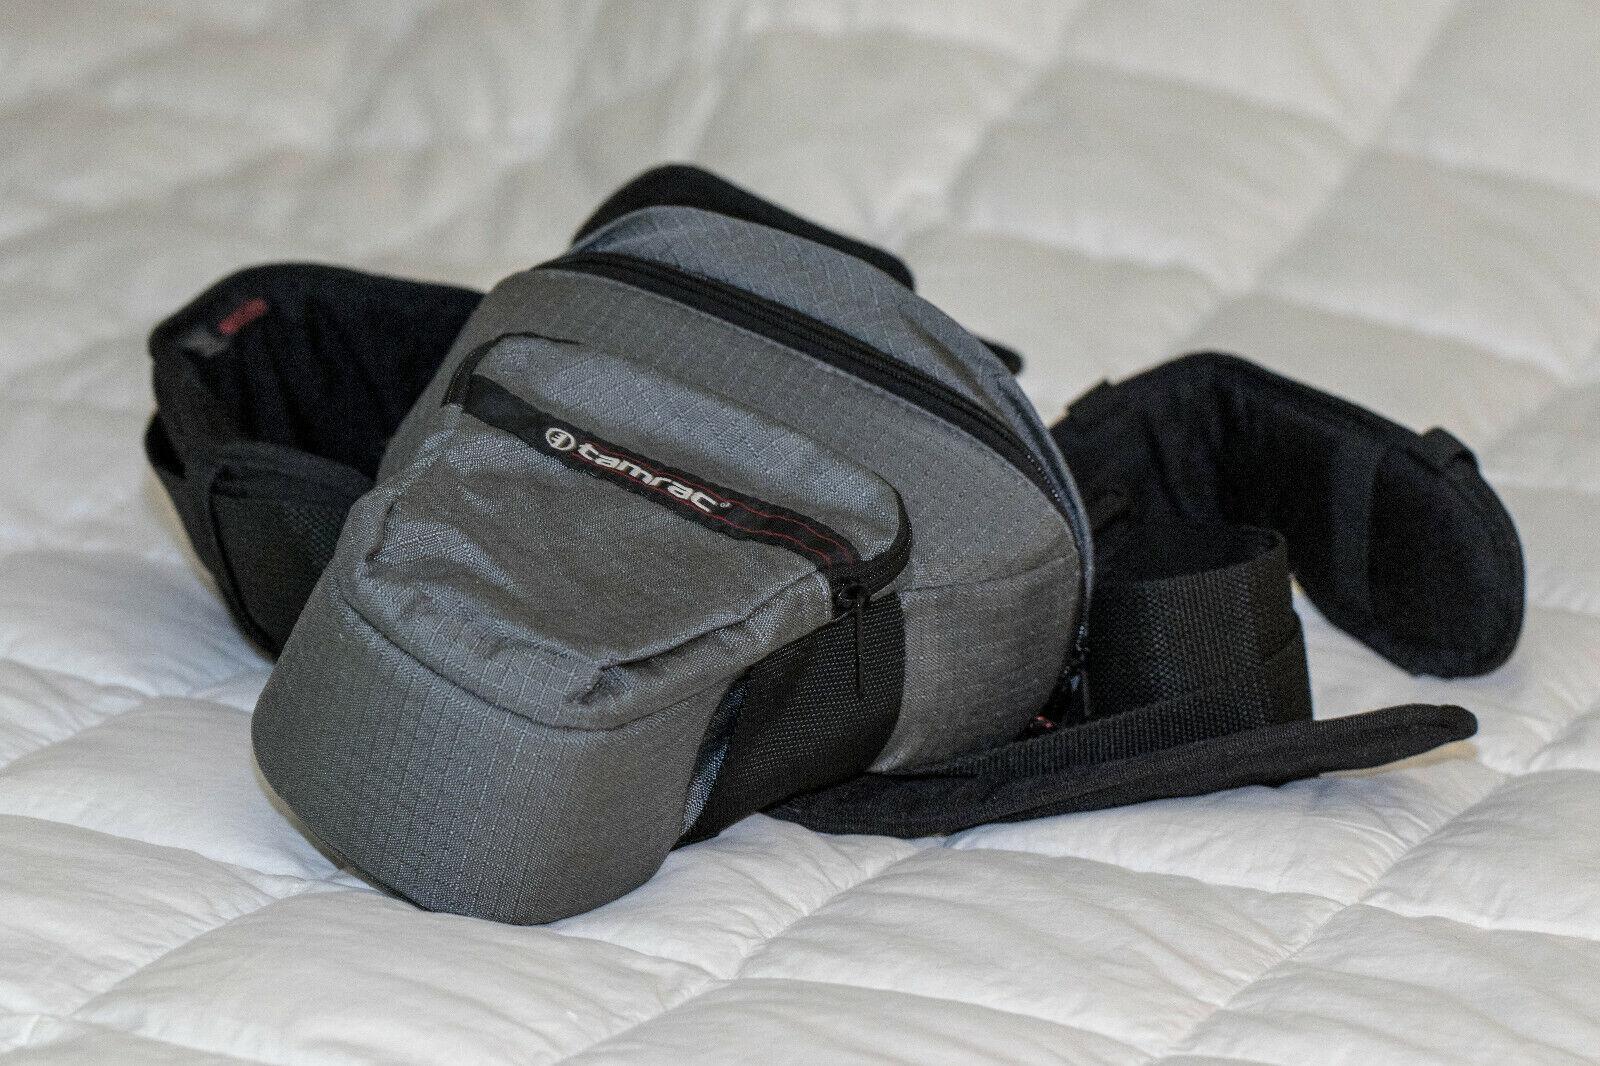 Tamrac Photographer s Belt INCL. Belt, Camera Case, And Filter Pouch - $5.00